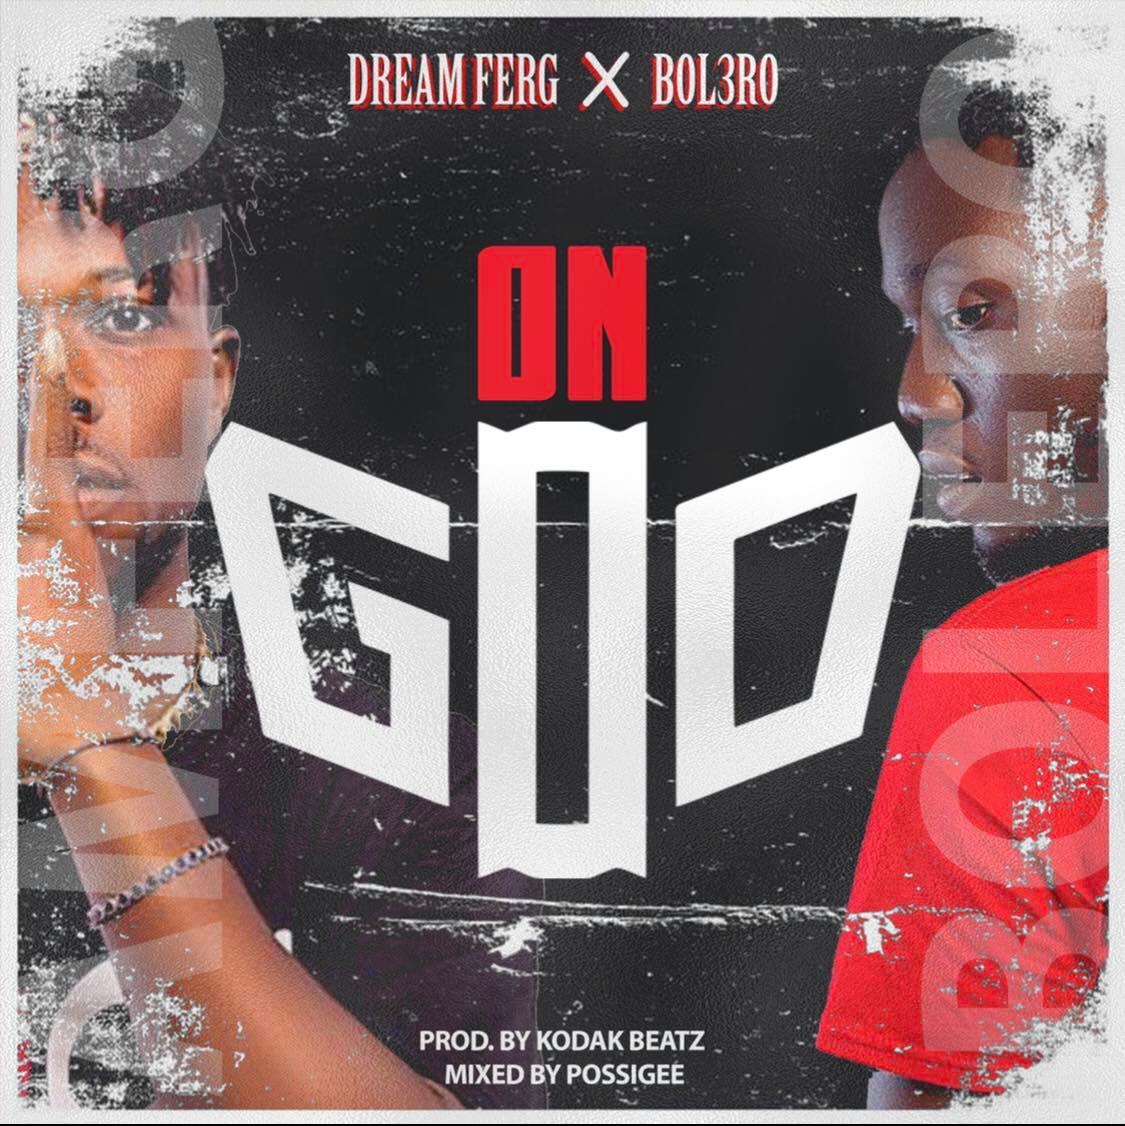 Dream Ferg x Bol3ro - ON GOD (prod. by Kodak Beatz & mixed by Possigee)